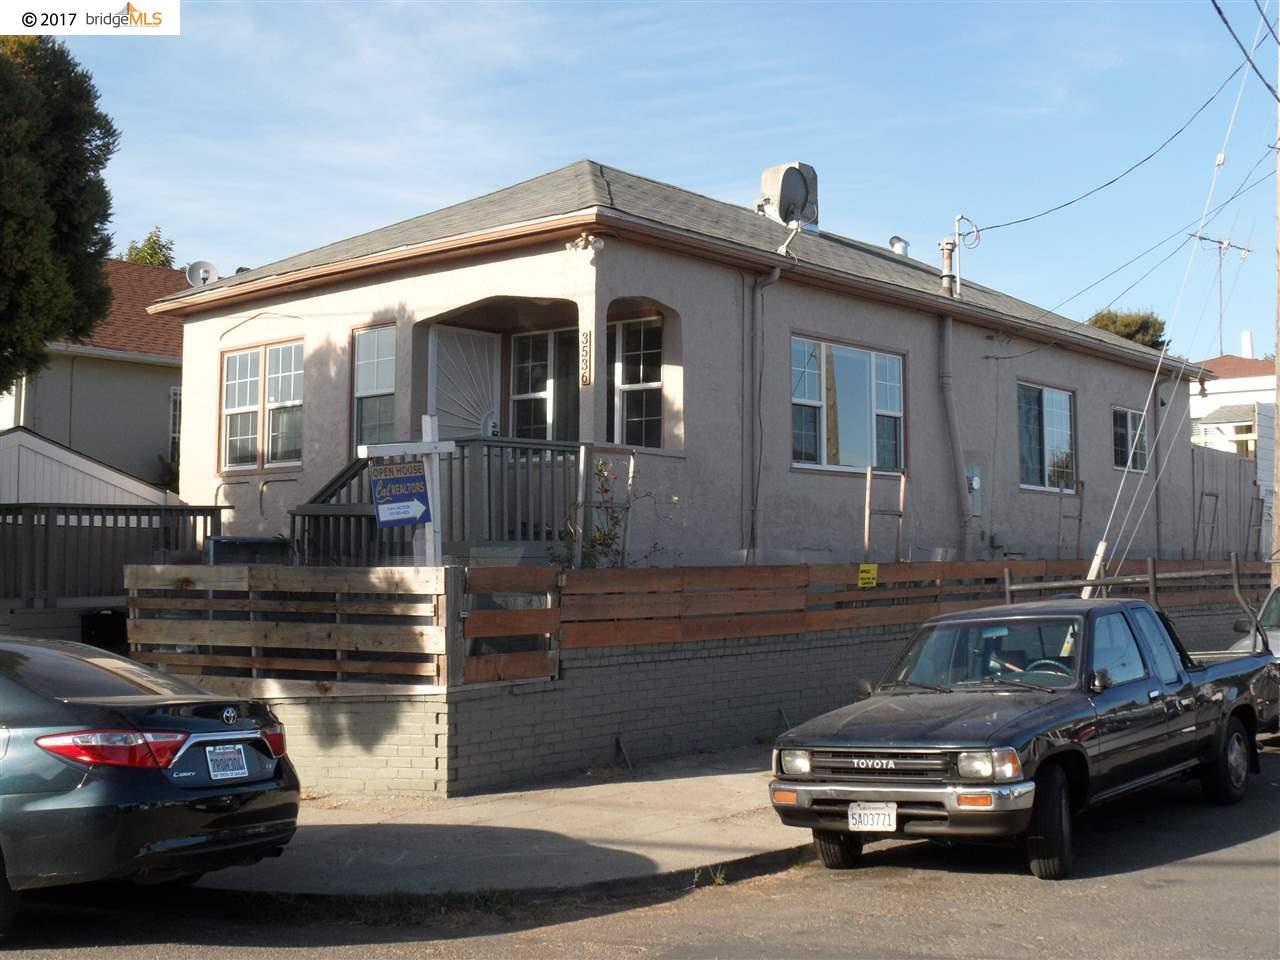 3536 Galindo St, Oakland, CA 94601 - MLS 40798259 - Coldwell Banker